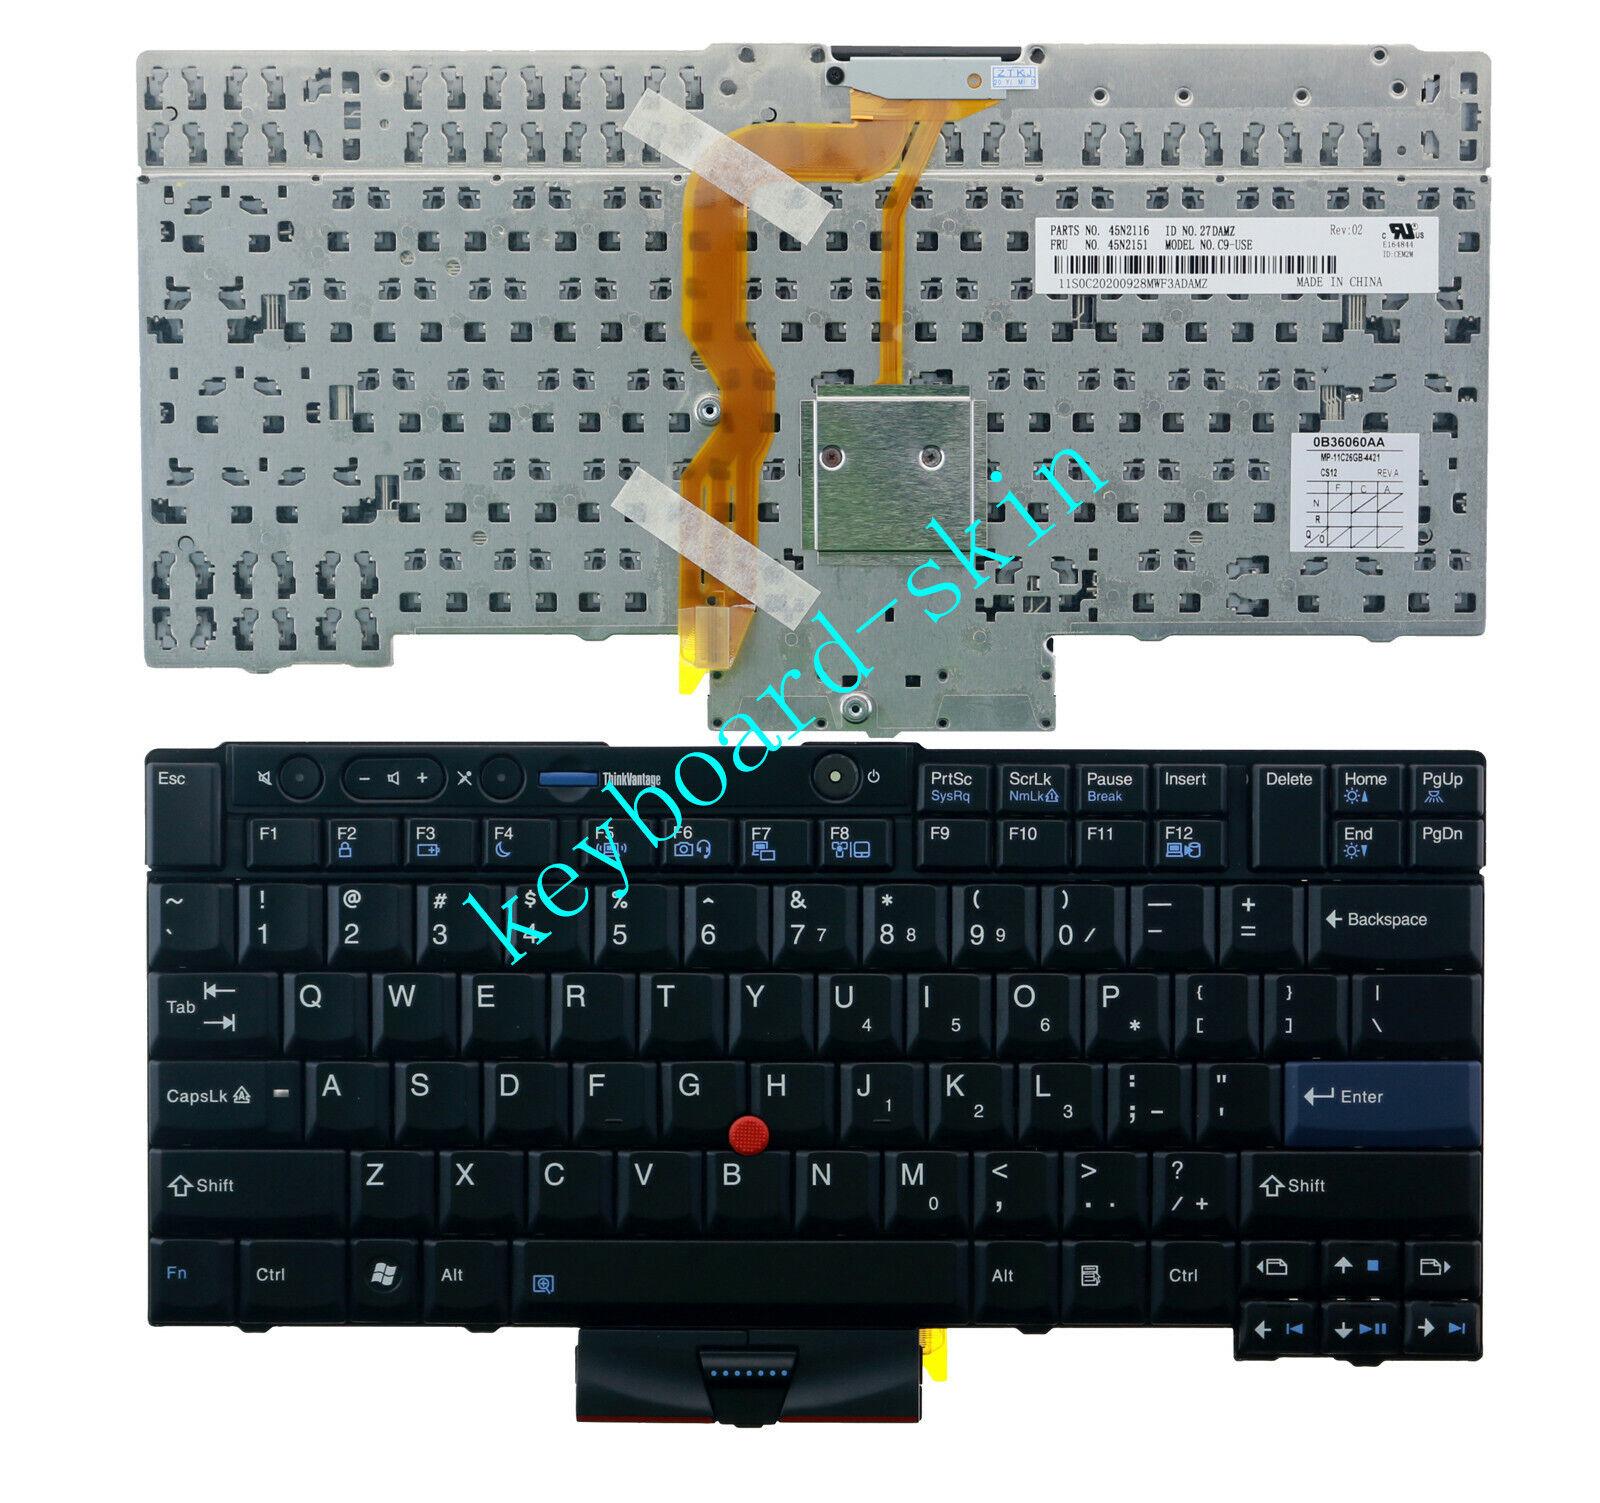 For lenovo IBM Thinkpad W520 W510 T420 T510 T520 X220 laptop MP-08G33US Keyboard